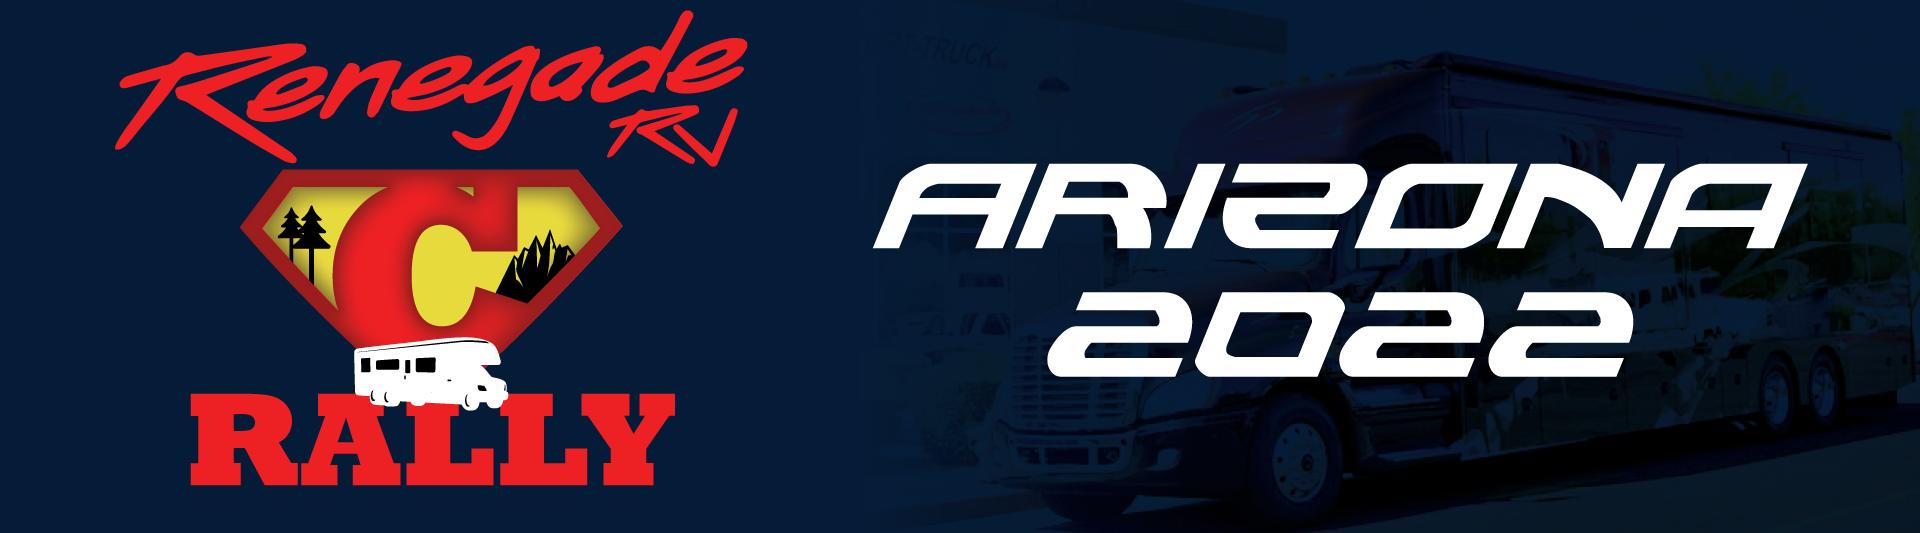 Renegade RV Rally-Arizona 2022